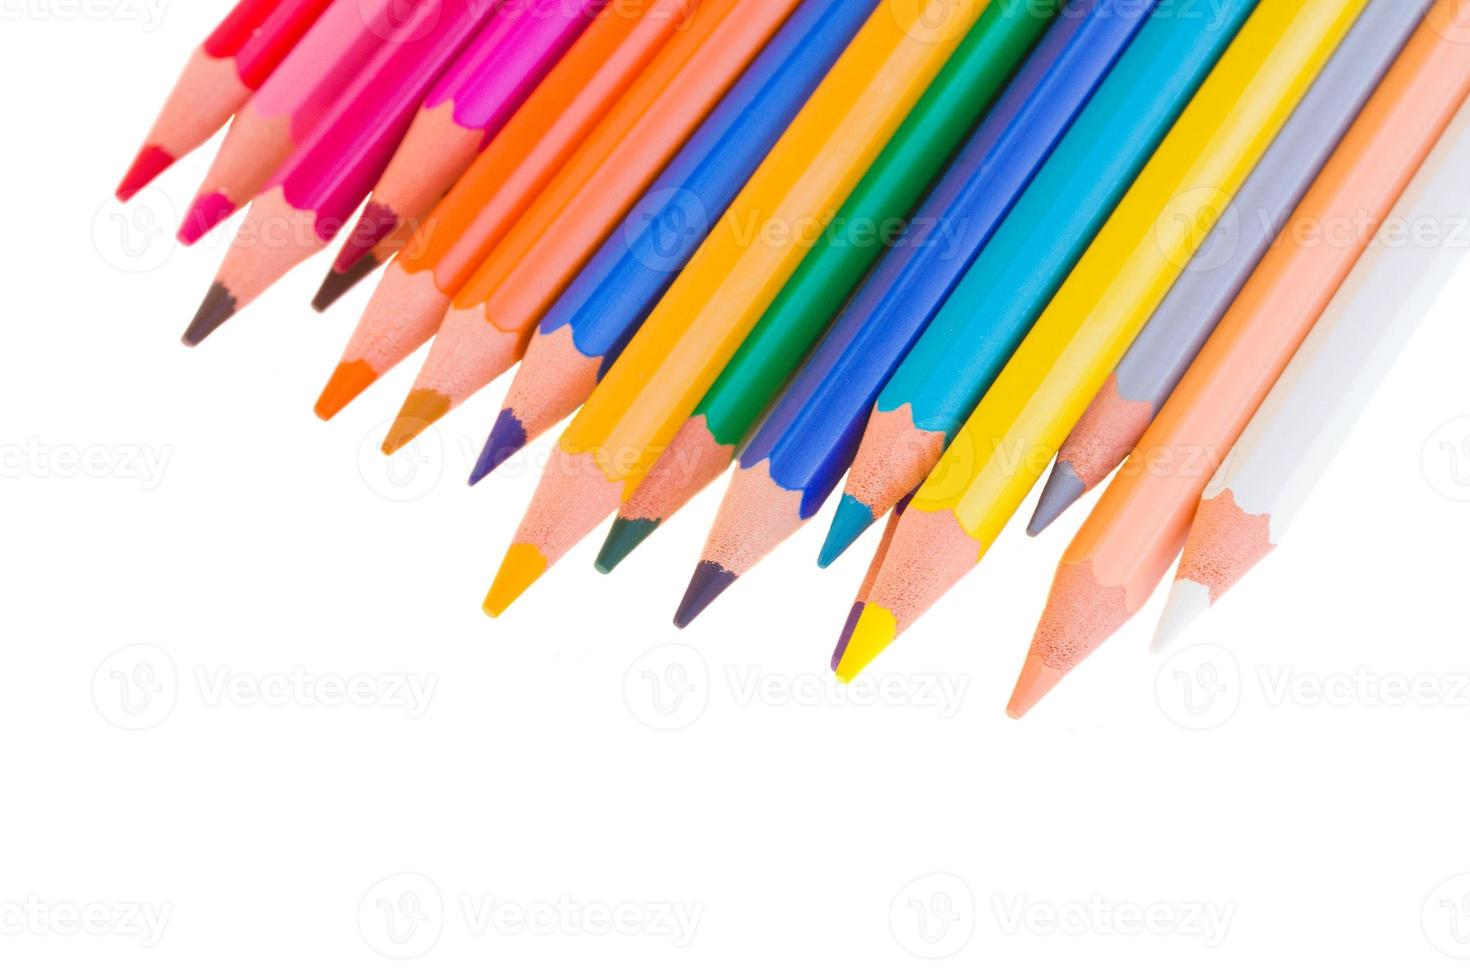 kleurrijke potloden close-up foto